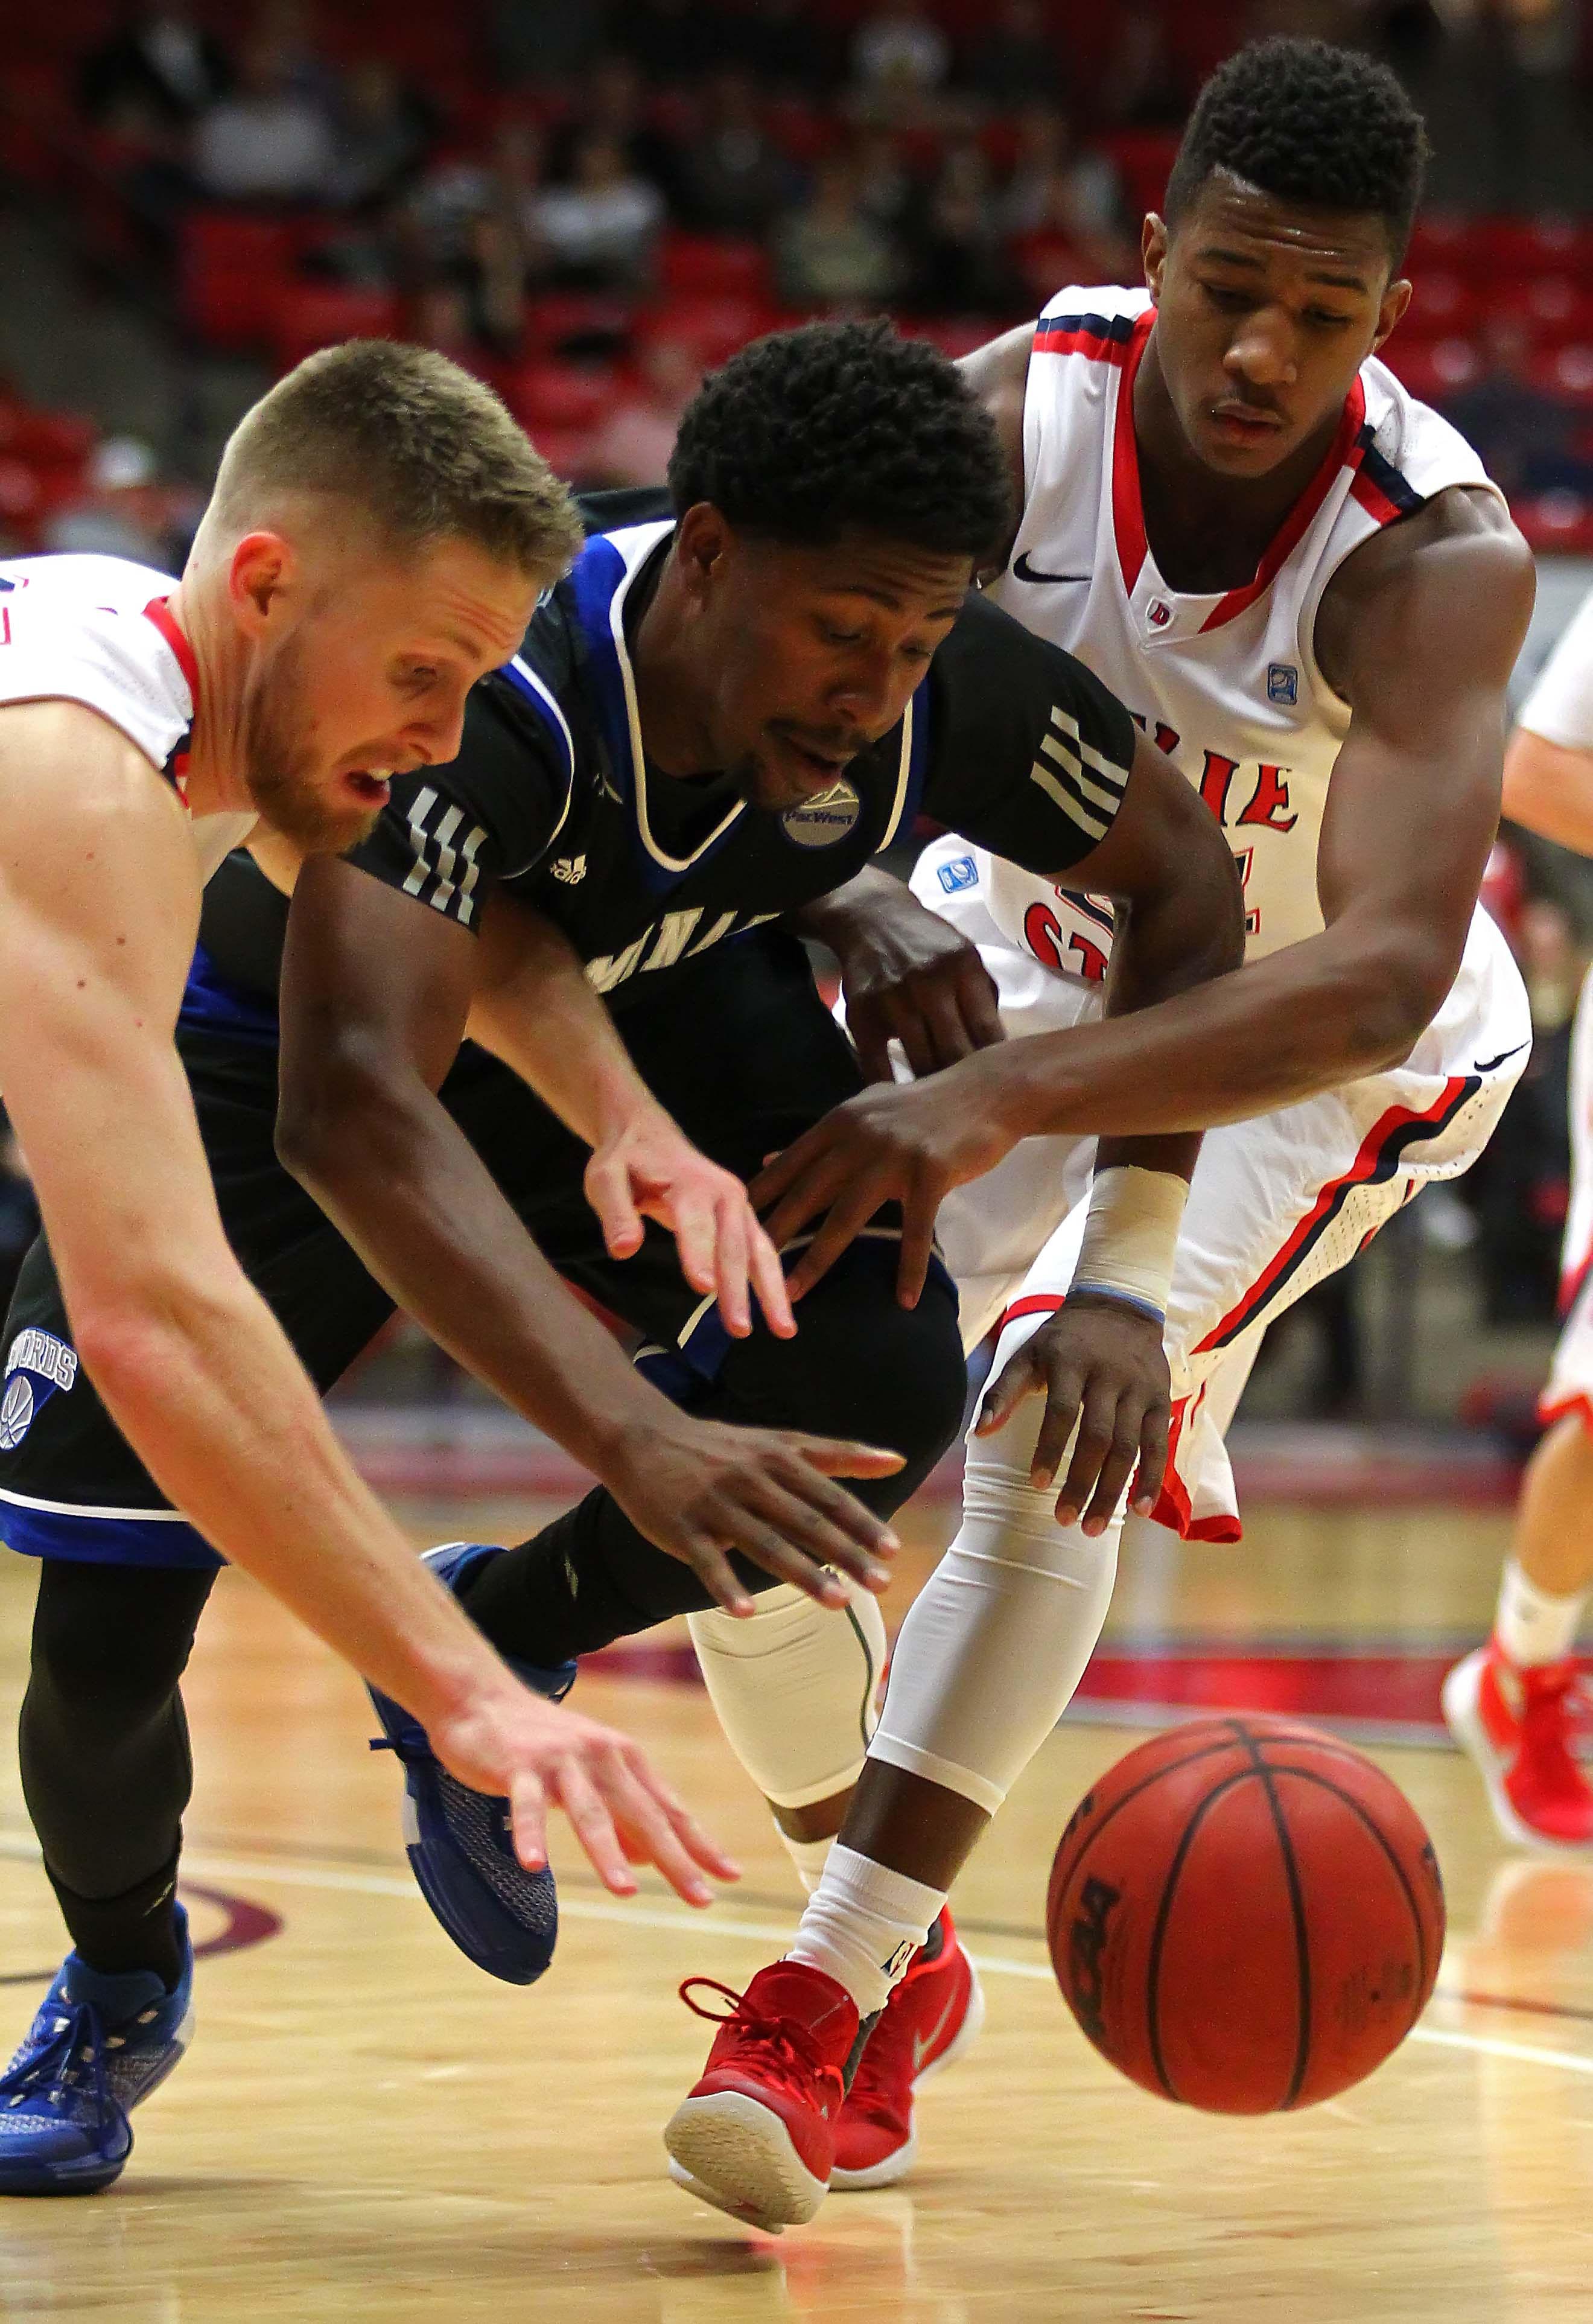 Dixie State University vs Chaminade University, Mens Basketball, St. George, Utah, Jan. 5, 2016,   Photo by Robert Hoppie, ASPpix.com, St. George News